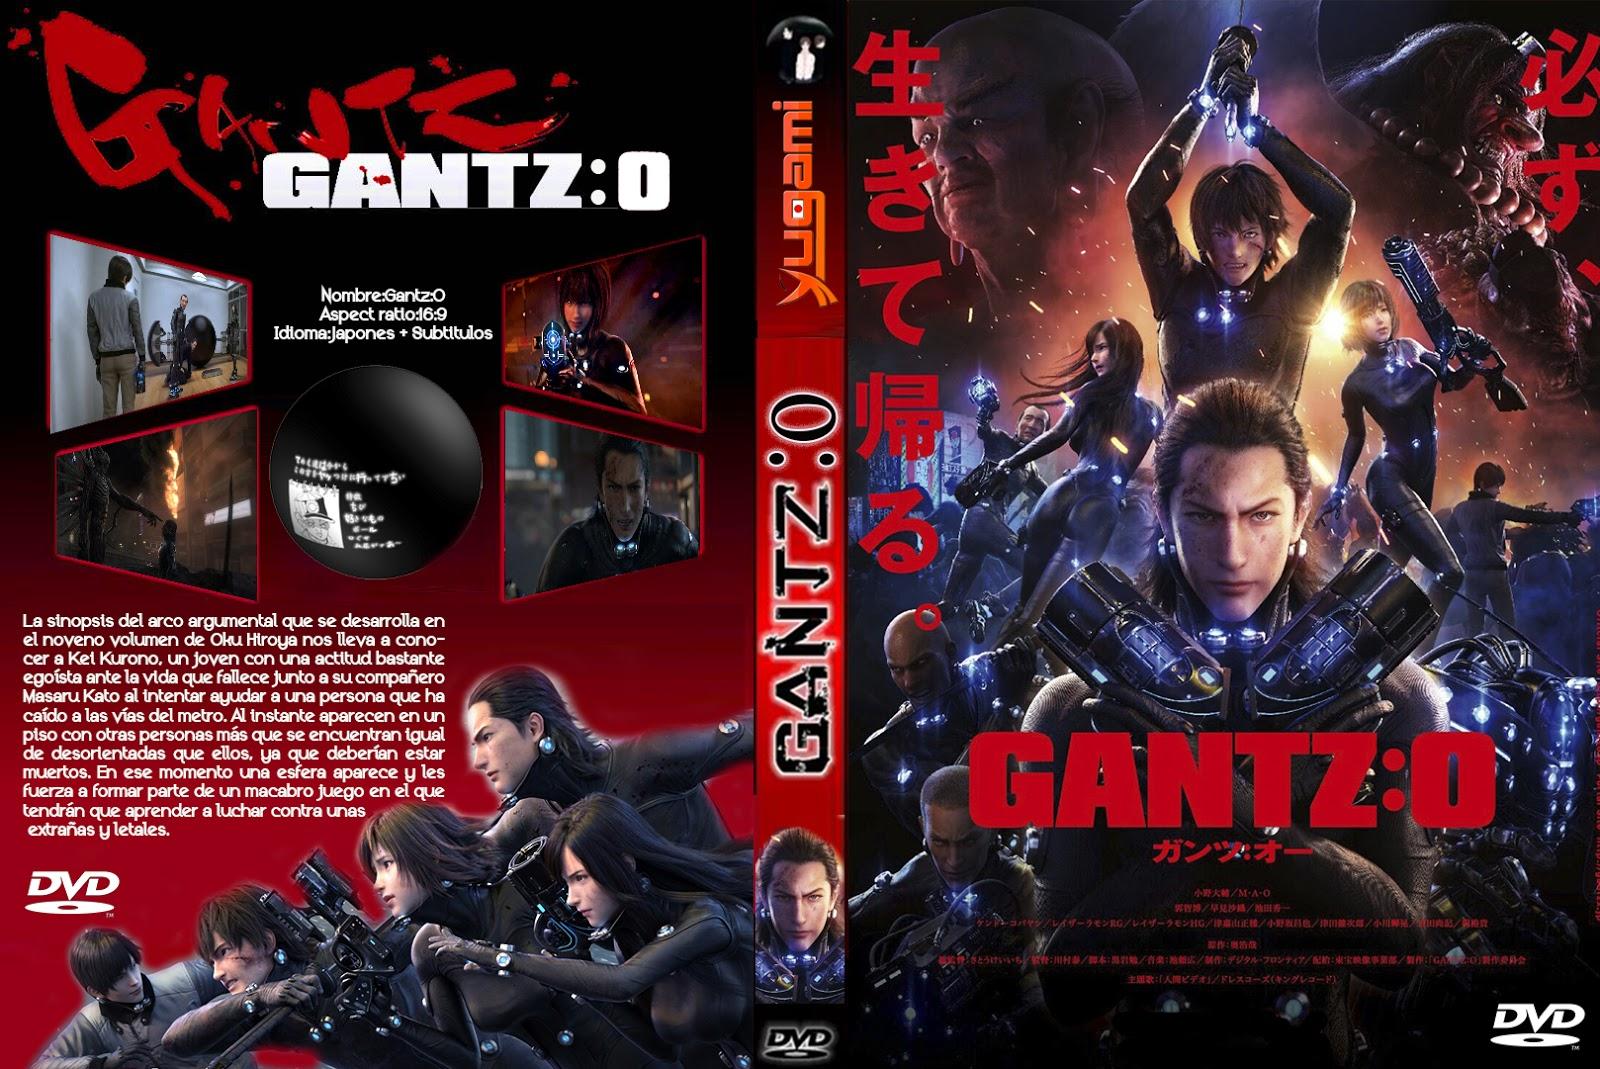 anime zaibatsu: Gantz:O MOVIE SUB ESP